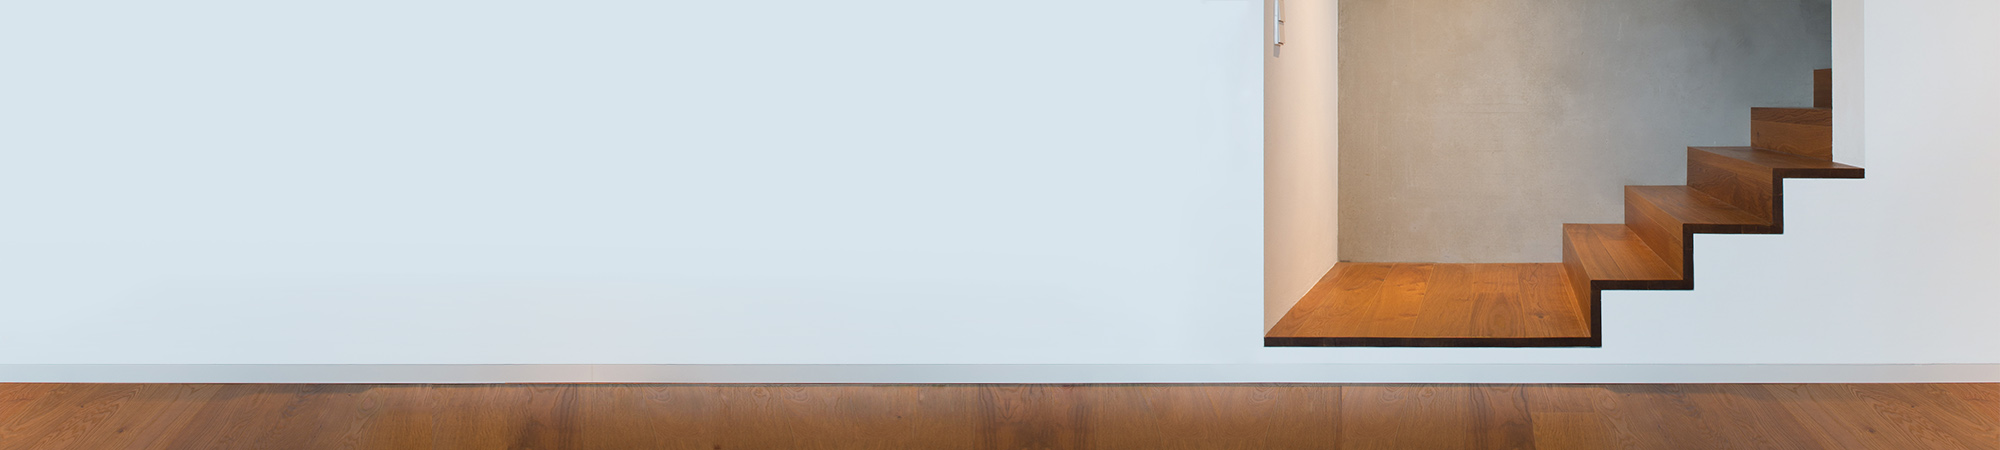 Wandbündige Sockelleisten sockelprofile wandbündig küffner aluzargen